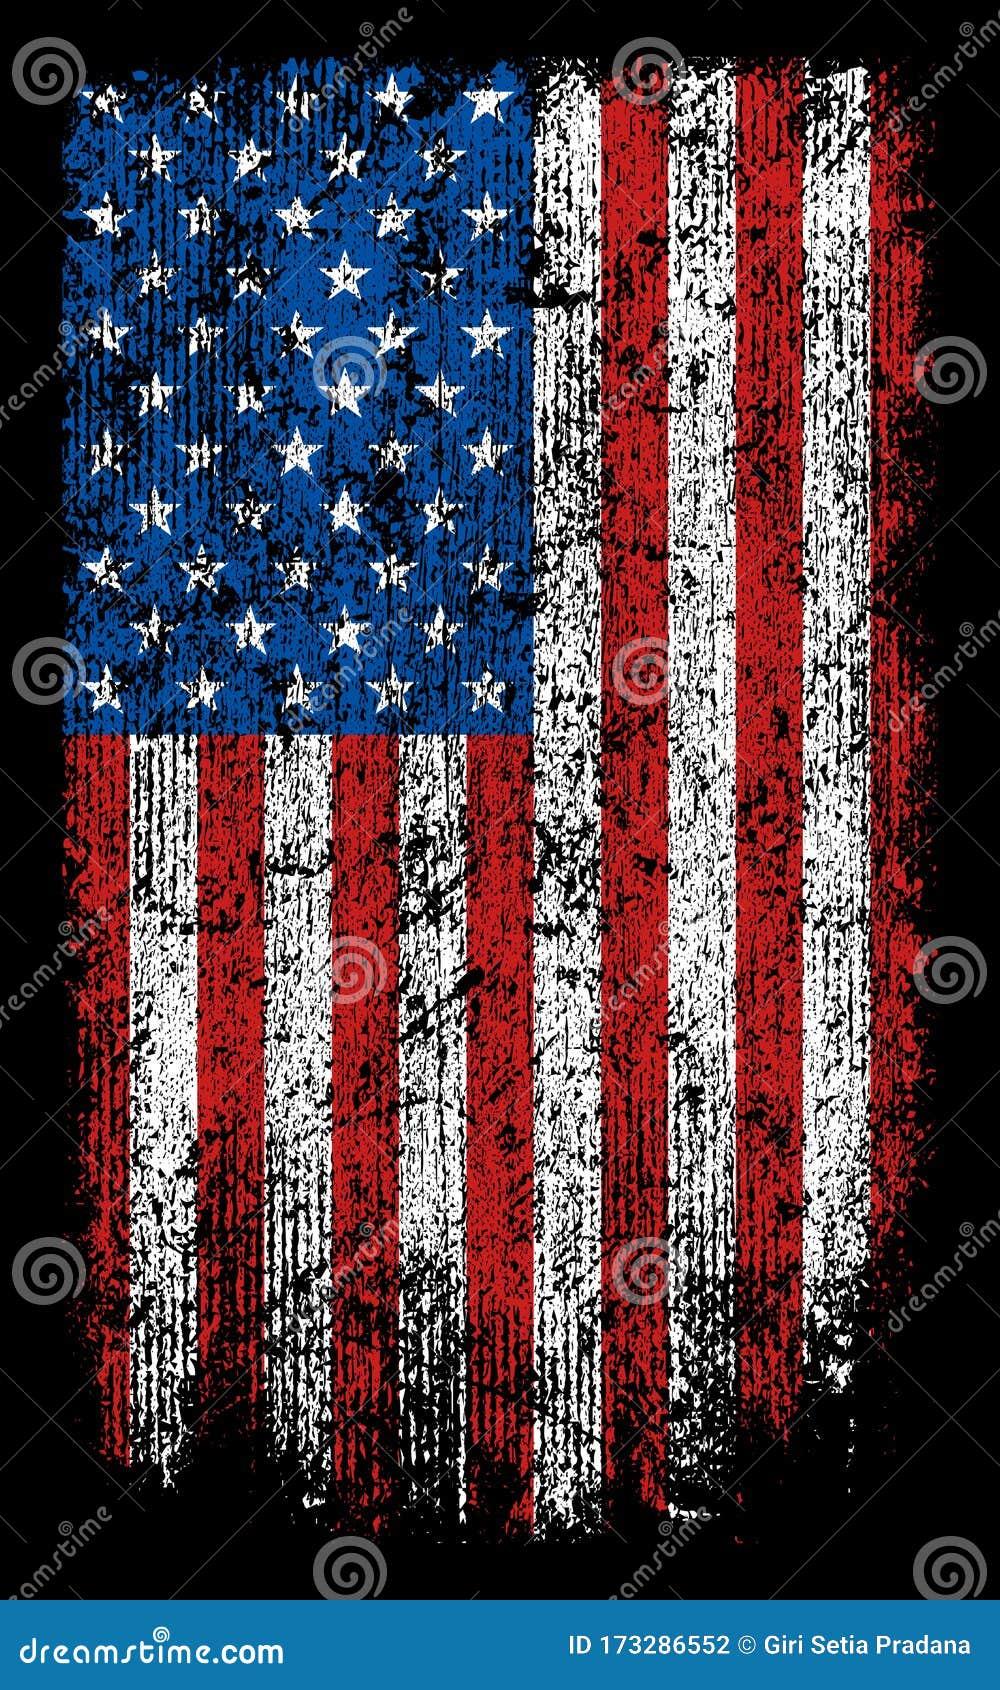 Grunge Usa Flag Wallpaper Background Vector Design Stock Vector Illustration Of Stars United 173286552